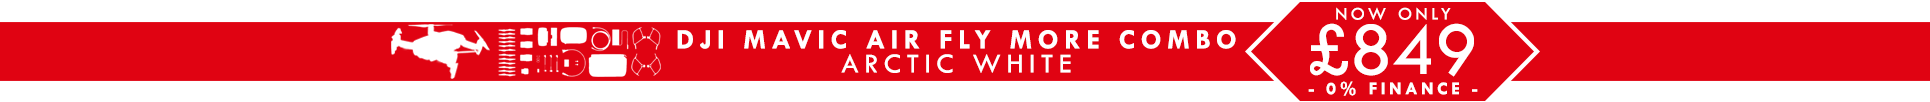 DJI Mavic Air Combo Only £849